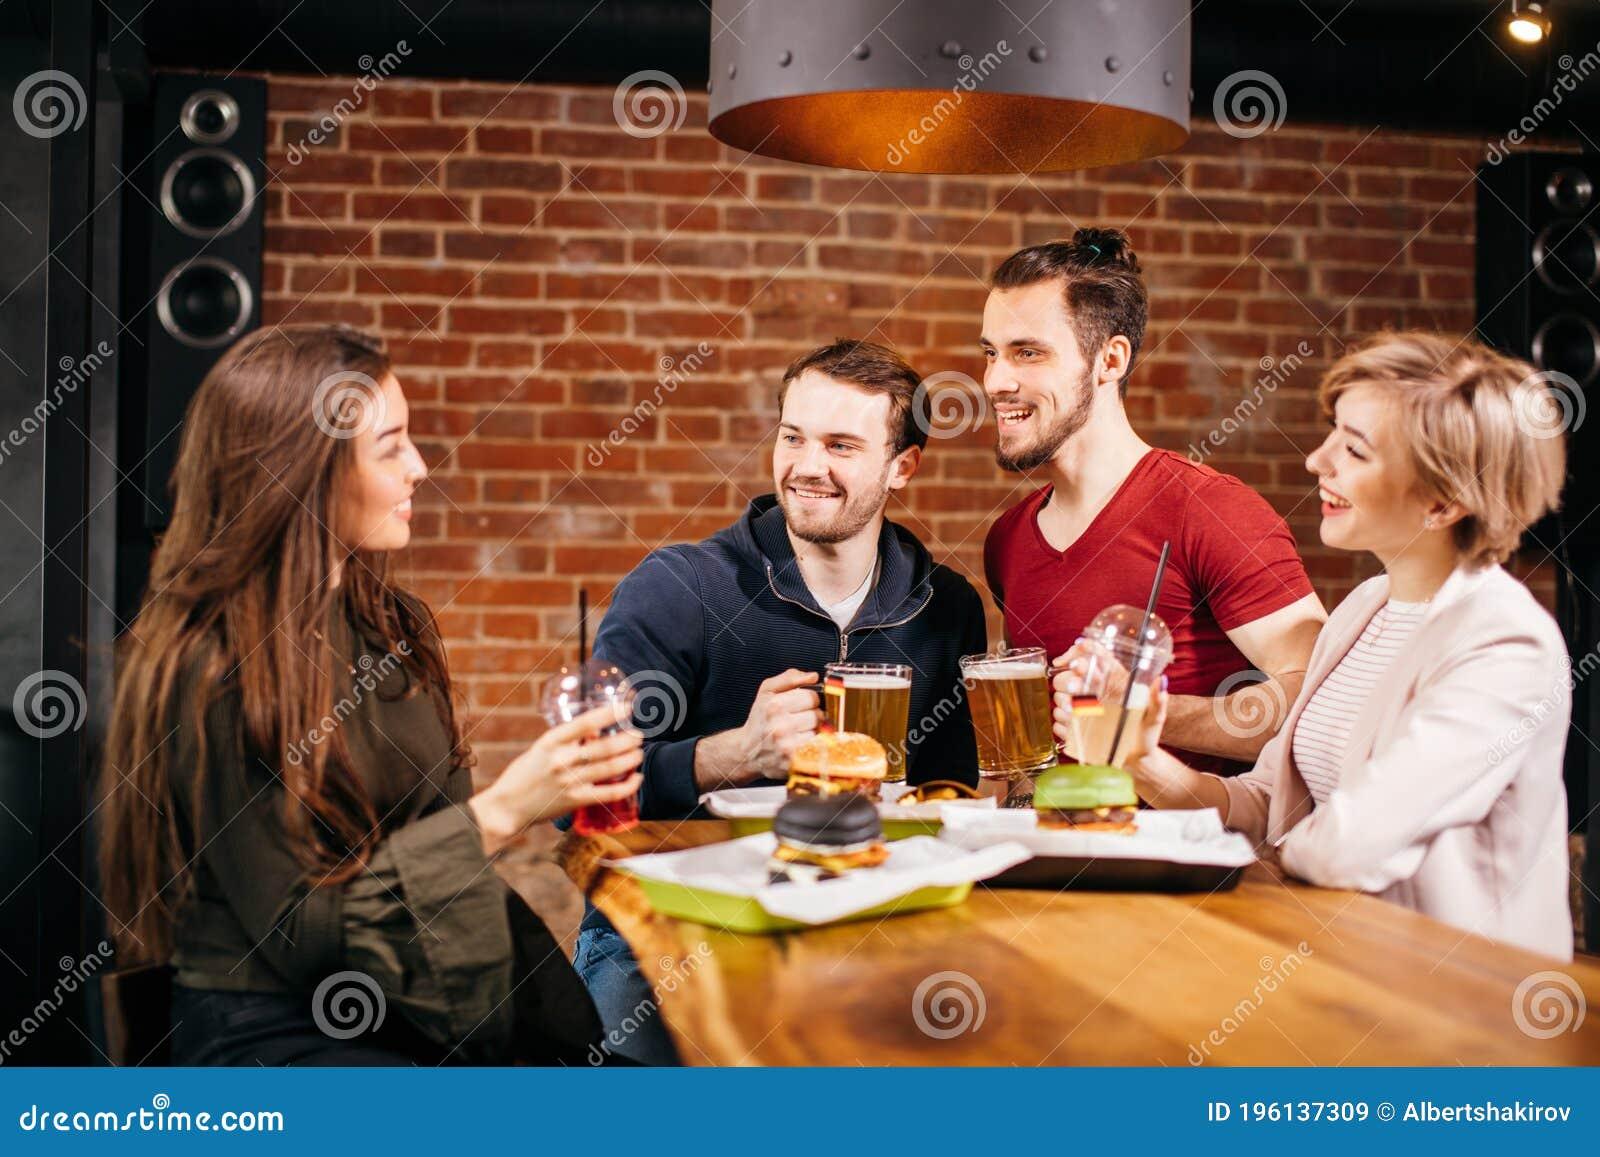 Group Of Mates Enjoying Night Out At Burger Bar Stock Image Image Of Happy Horizontal 196137309